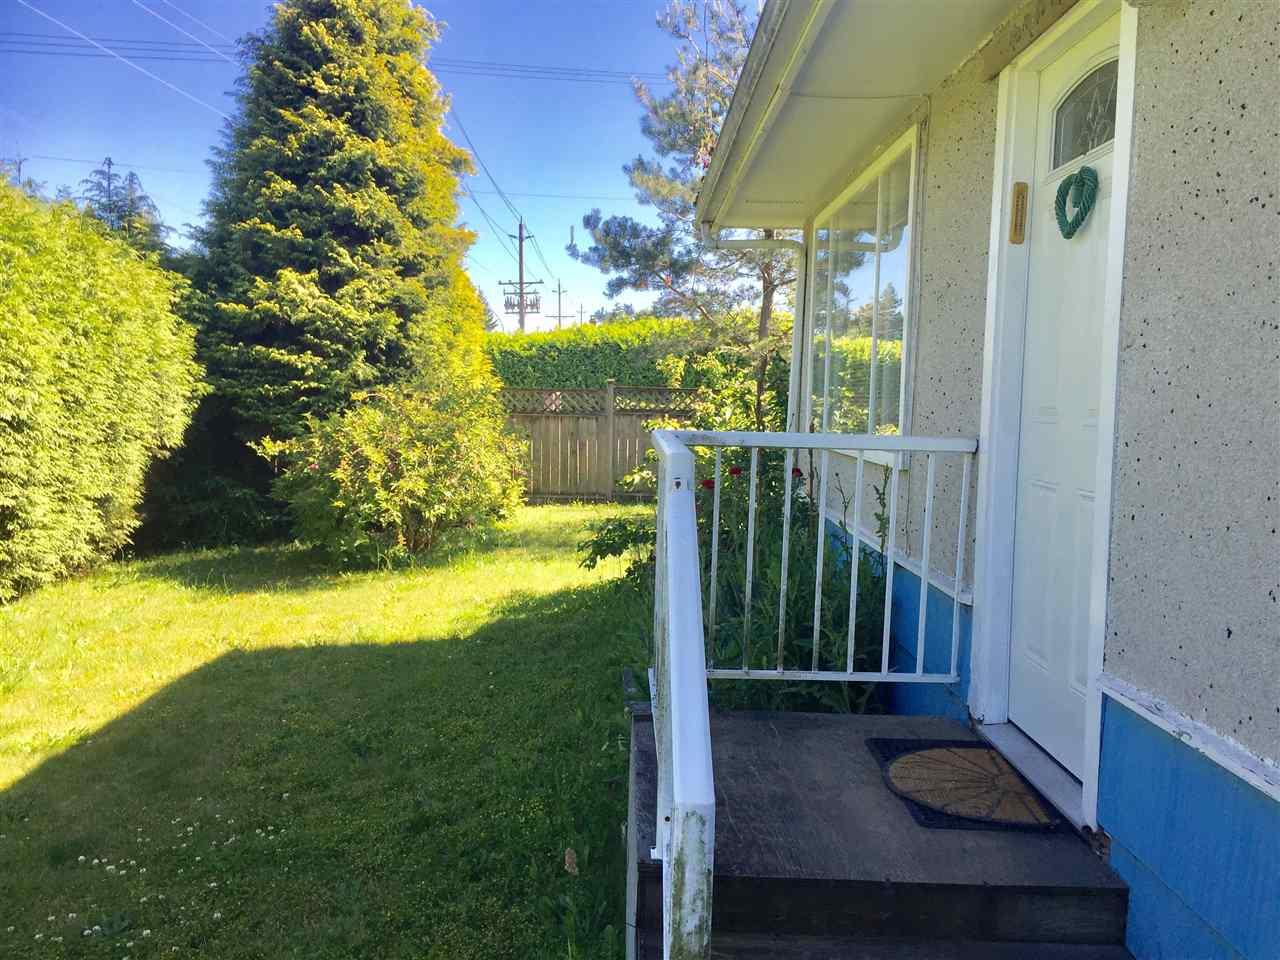 Detached at 1765 156 STREET, South Surrey White Rock, British Columbia. Image 1